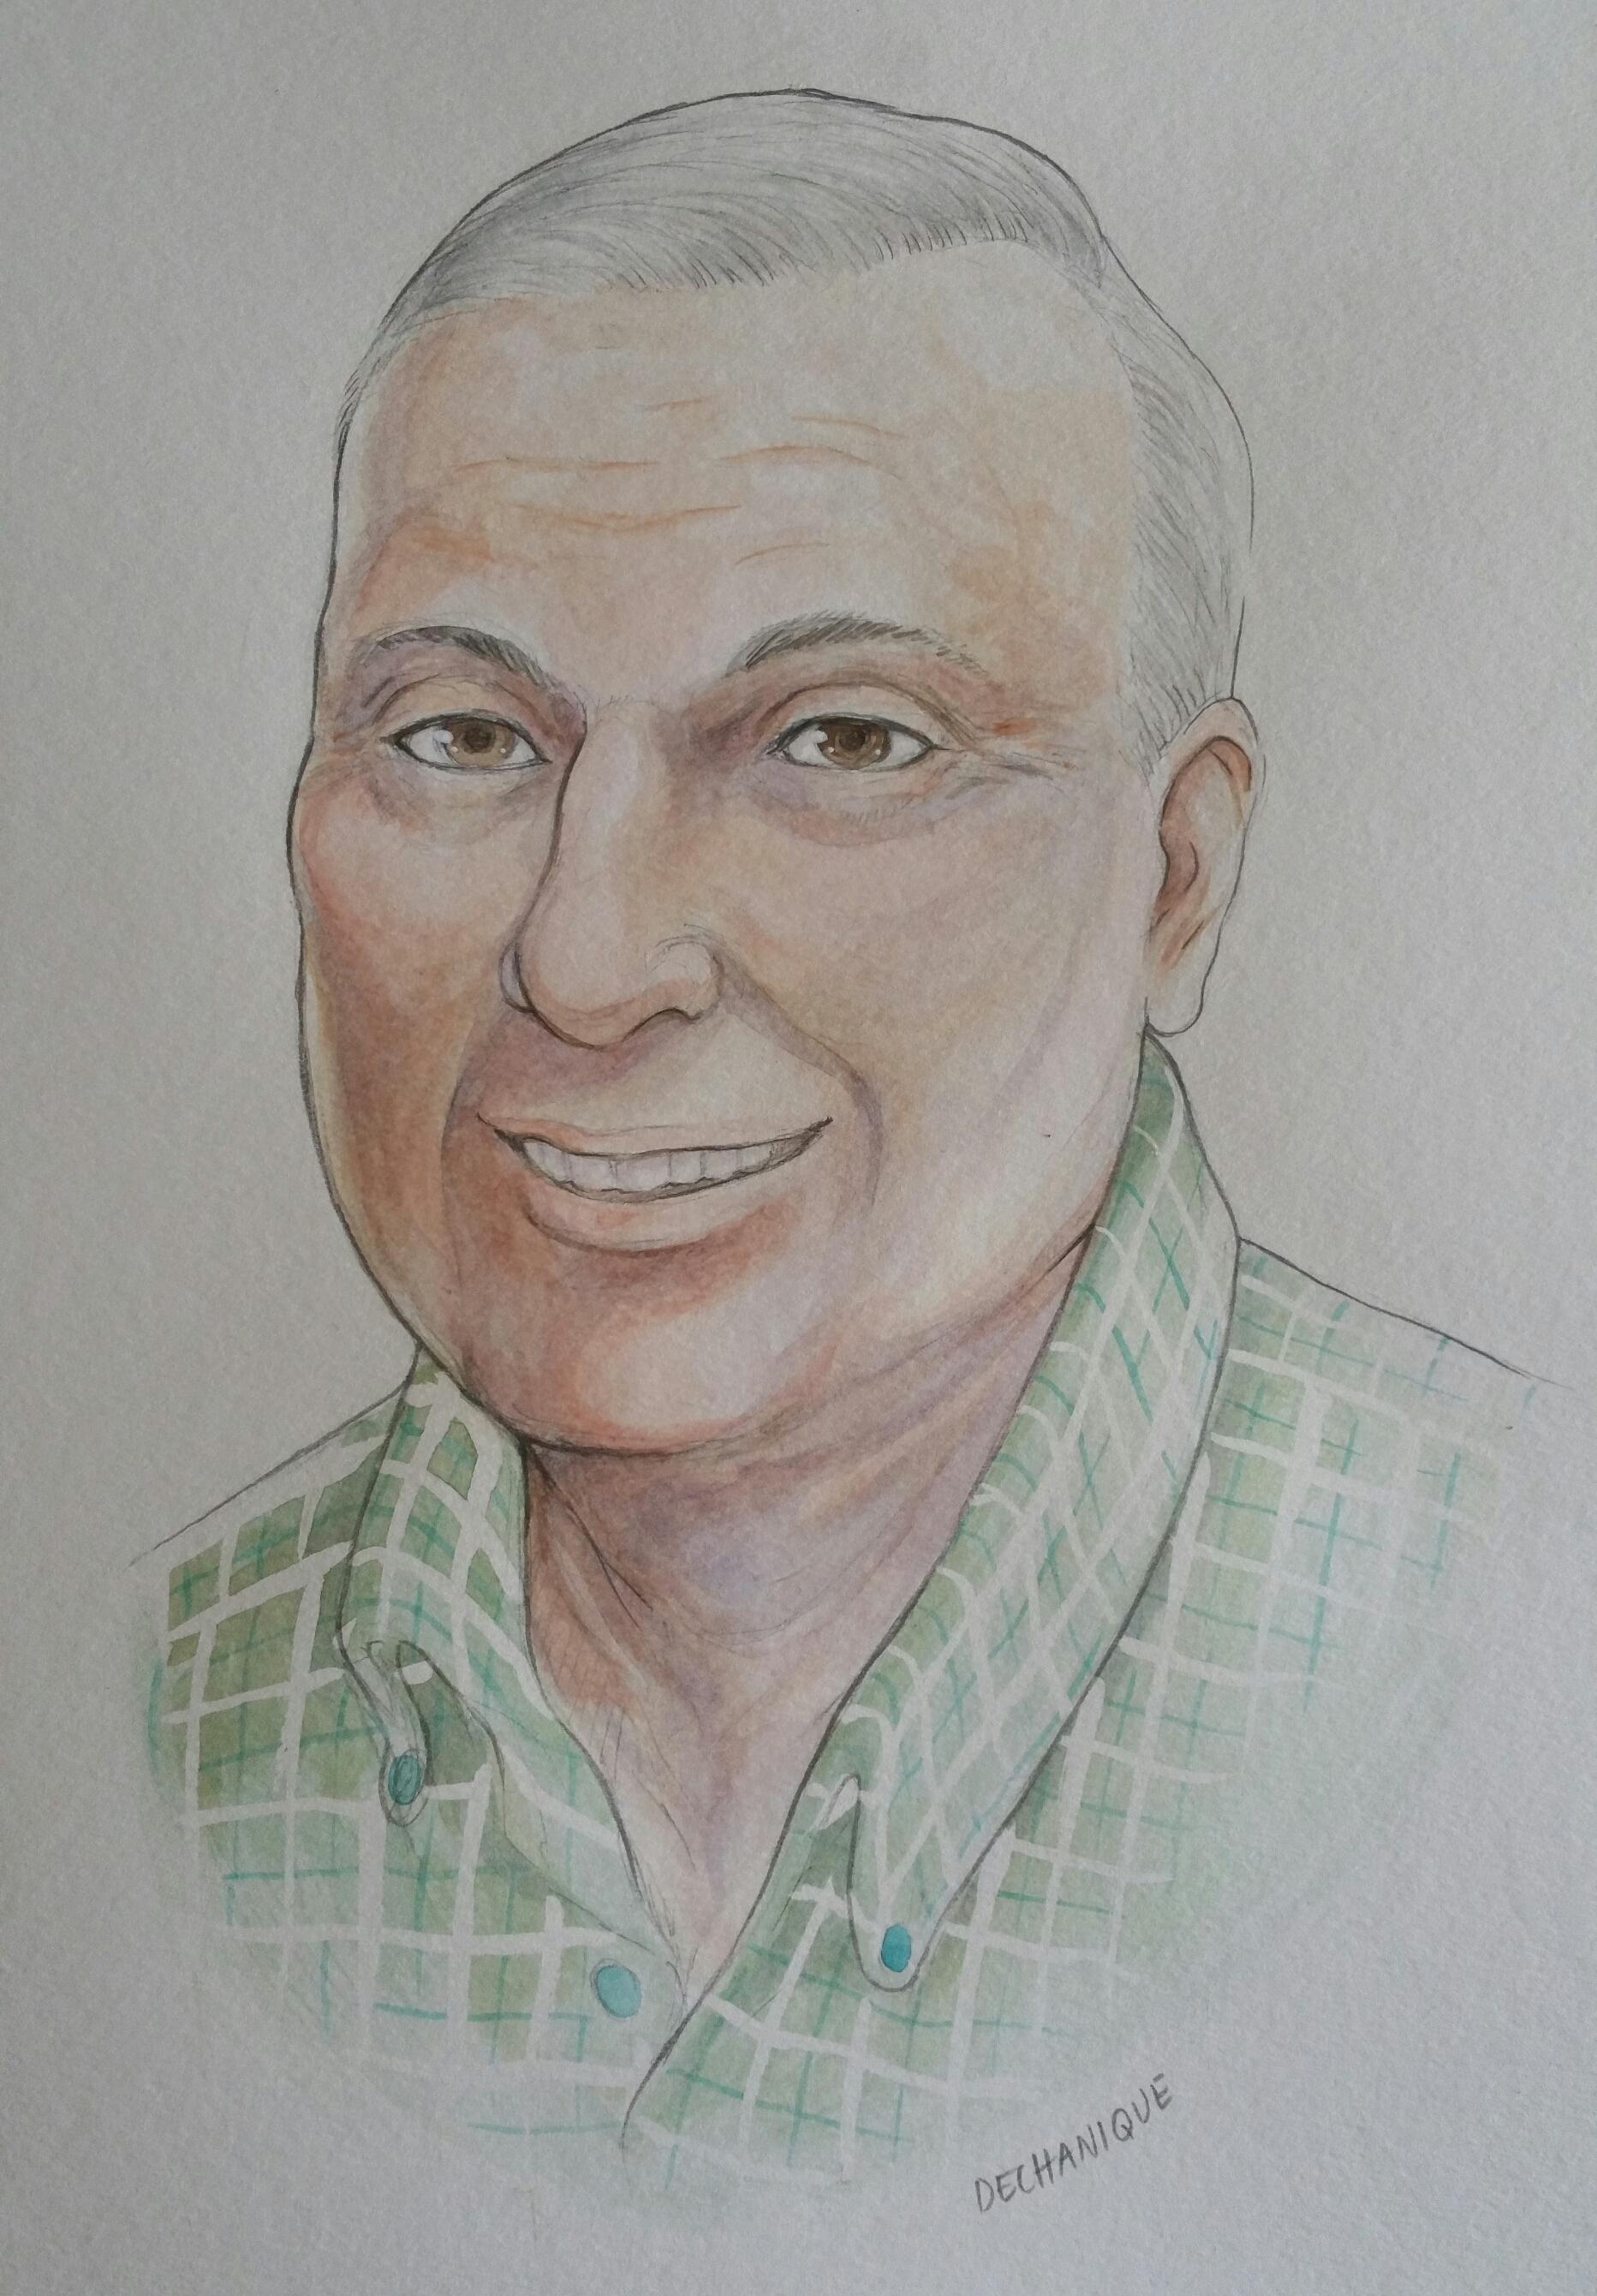 Xavier Echanique